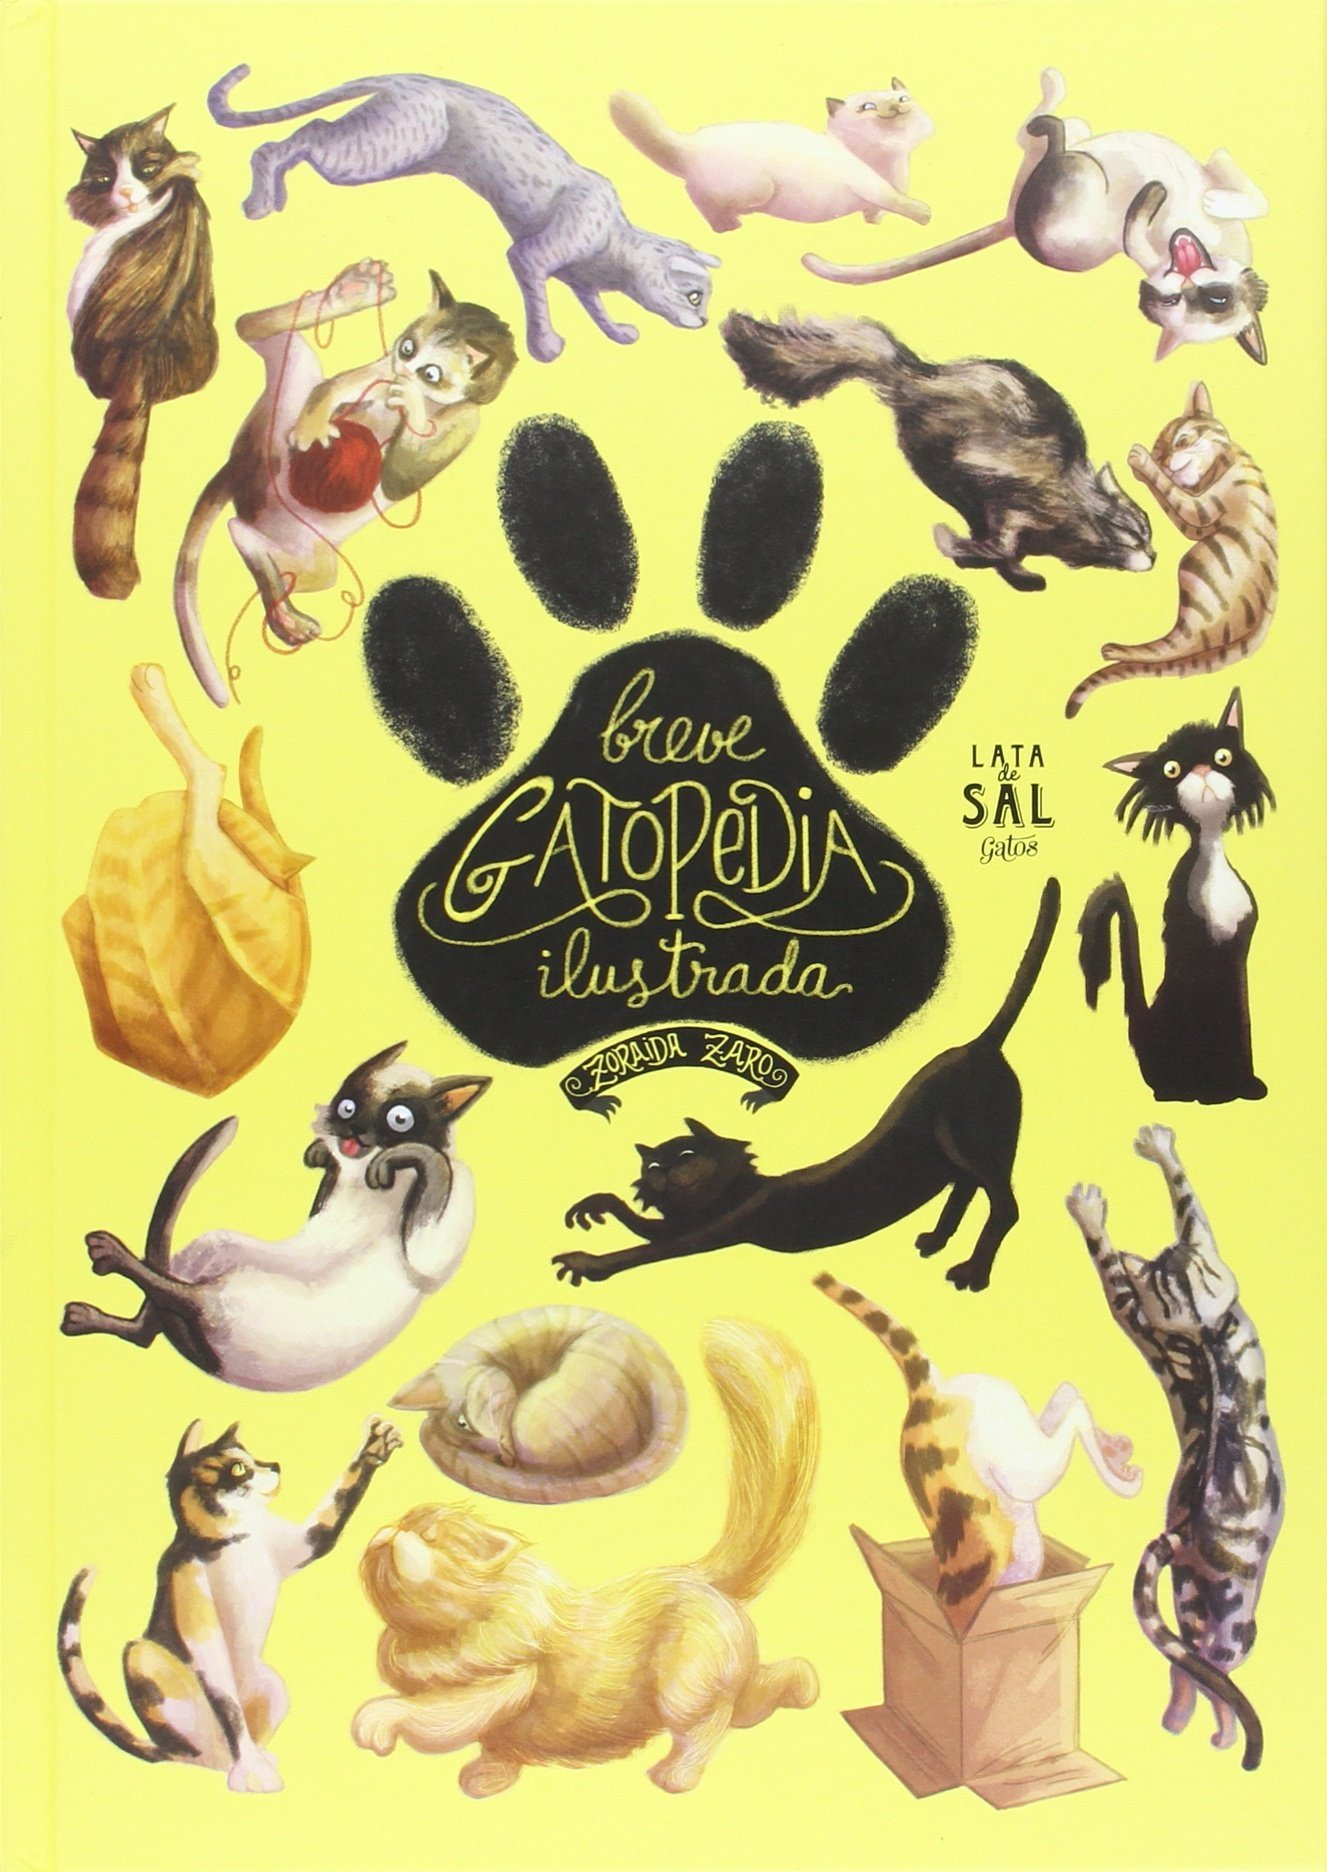 Breve Gatopedia Ilustrada (Galician) Hardcover – 2016